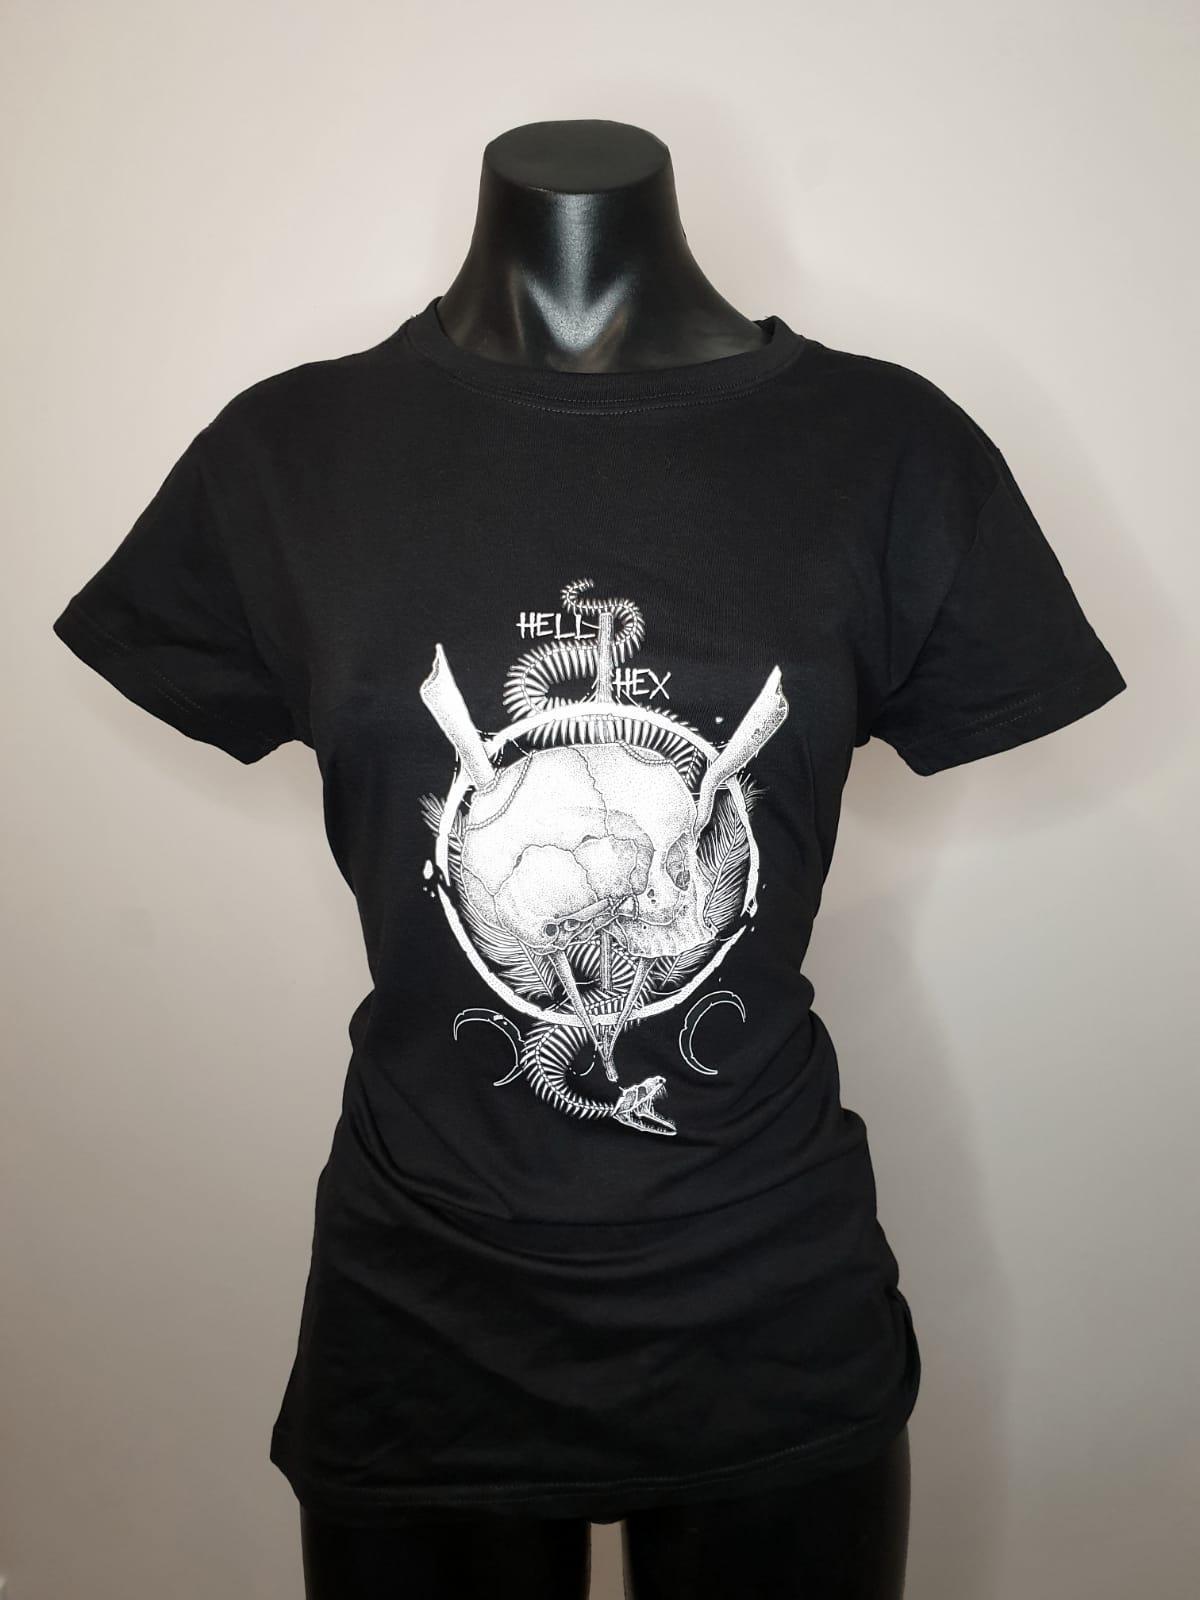 Hell hex T shirt